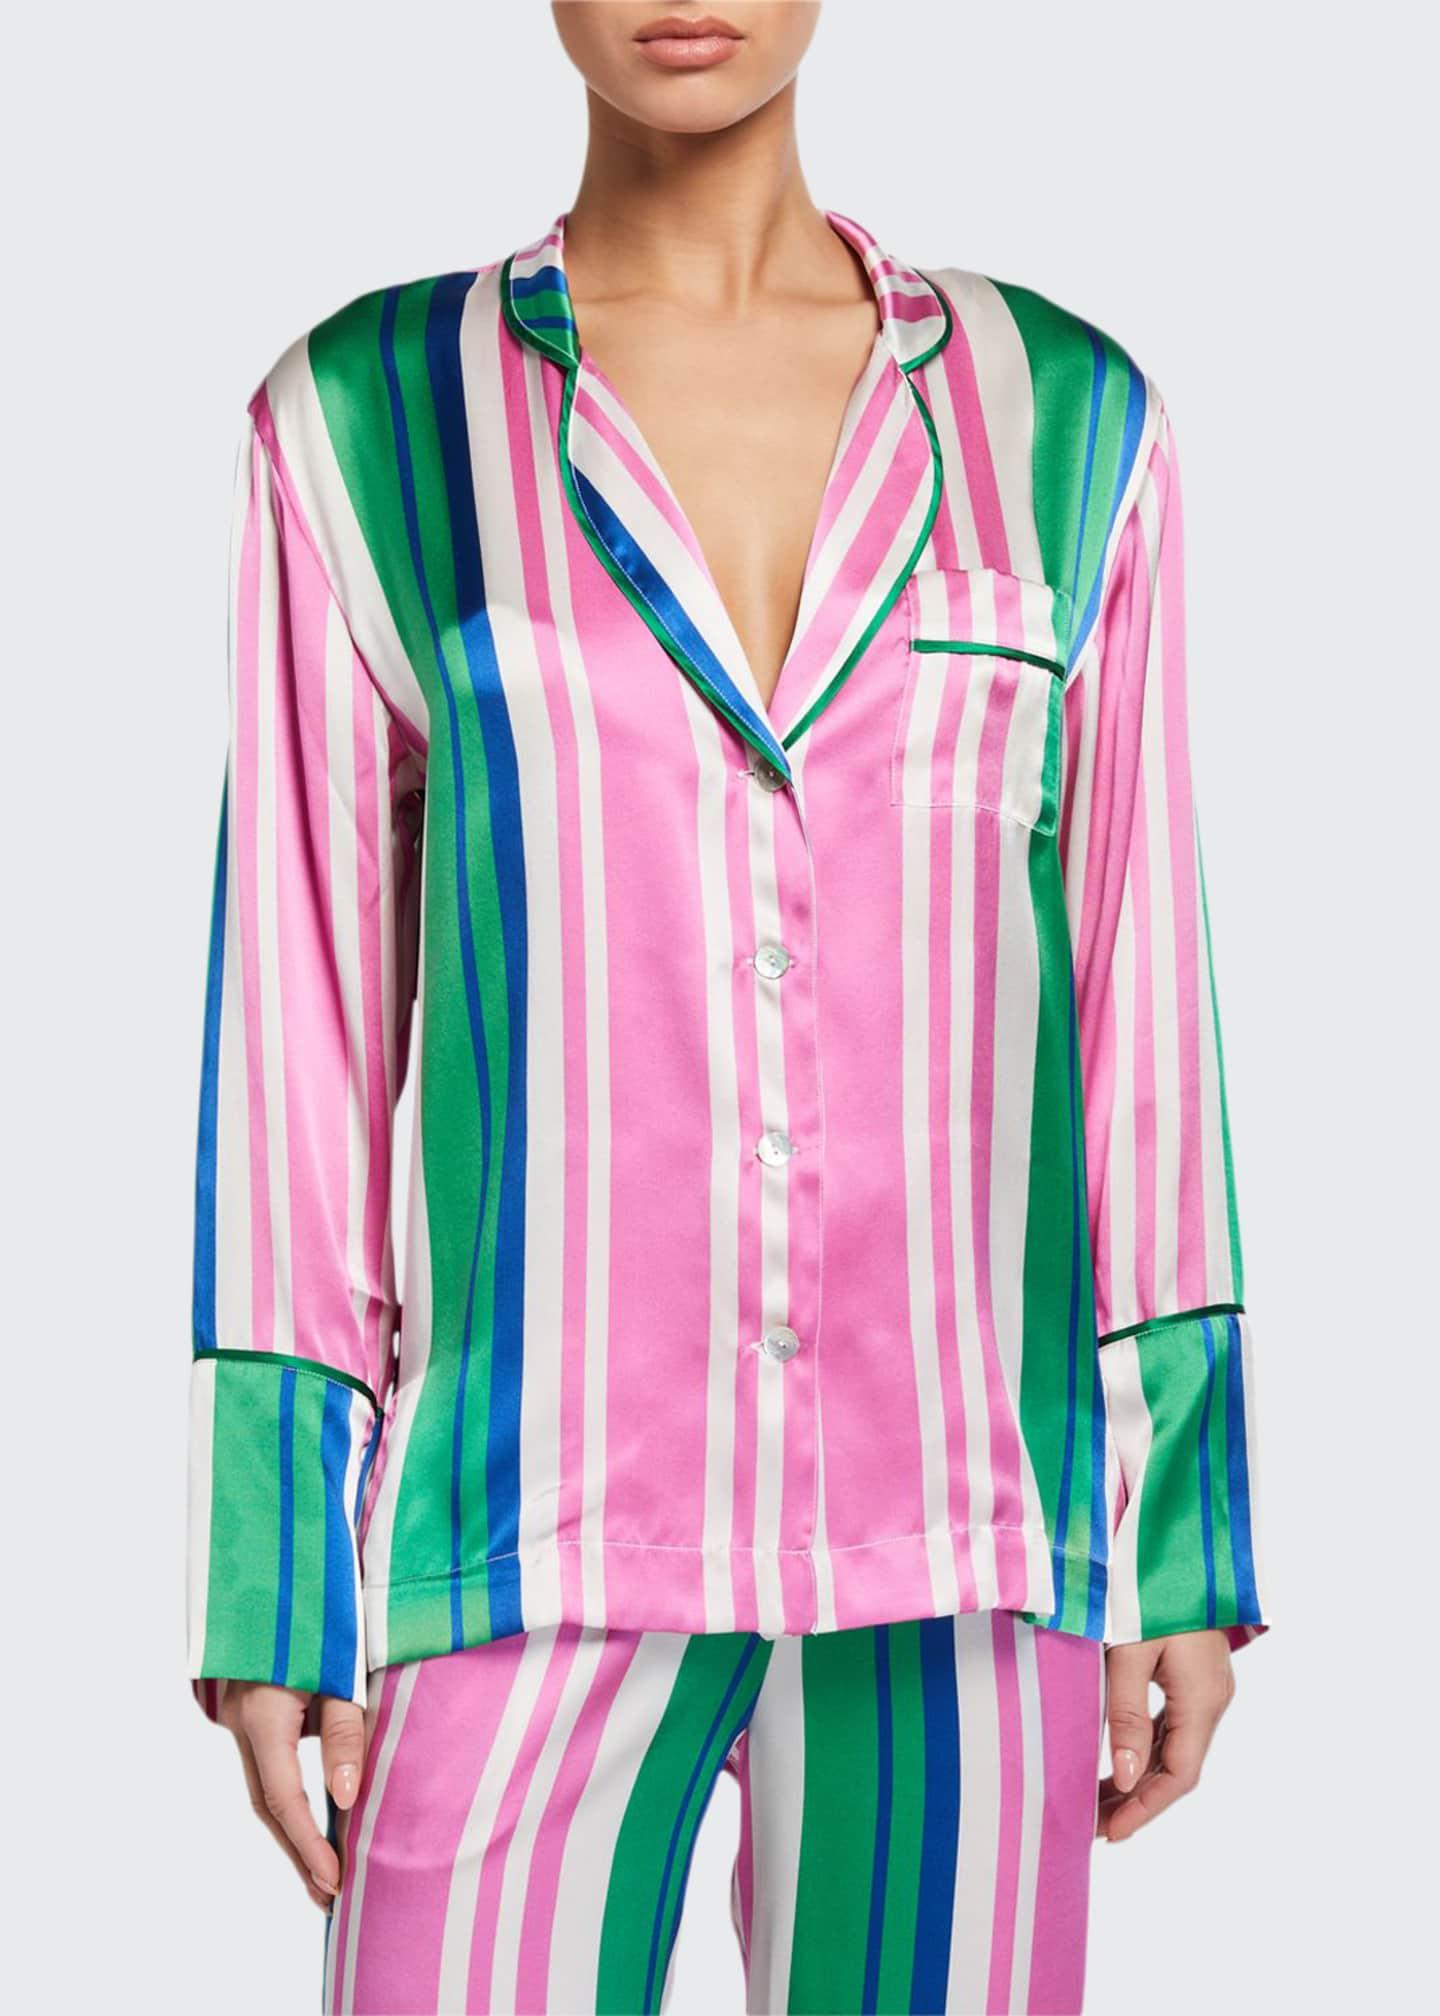 Hesper Fox Evie Striped Silk Pajama Shirt